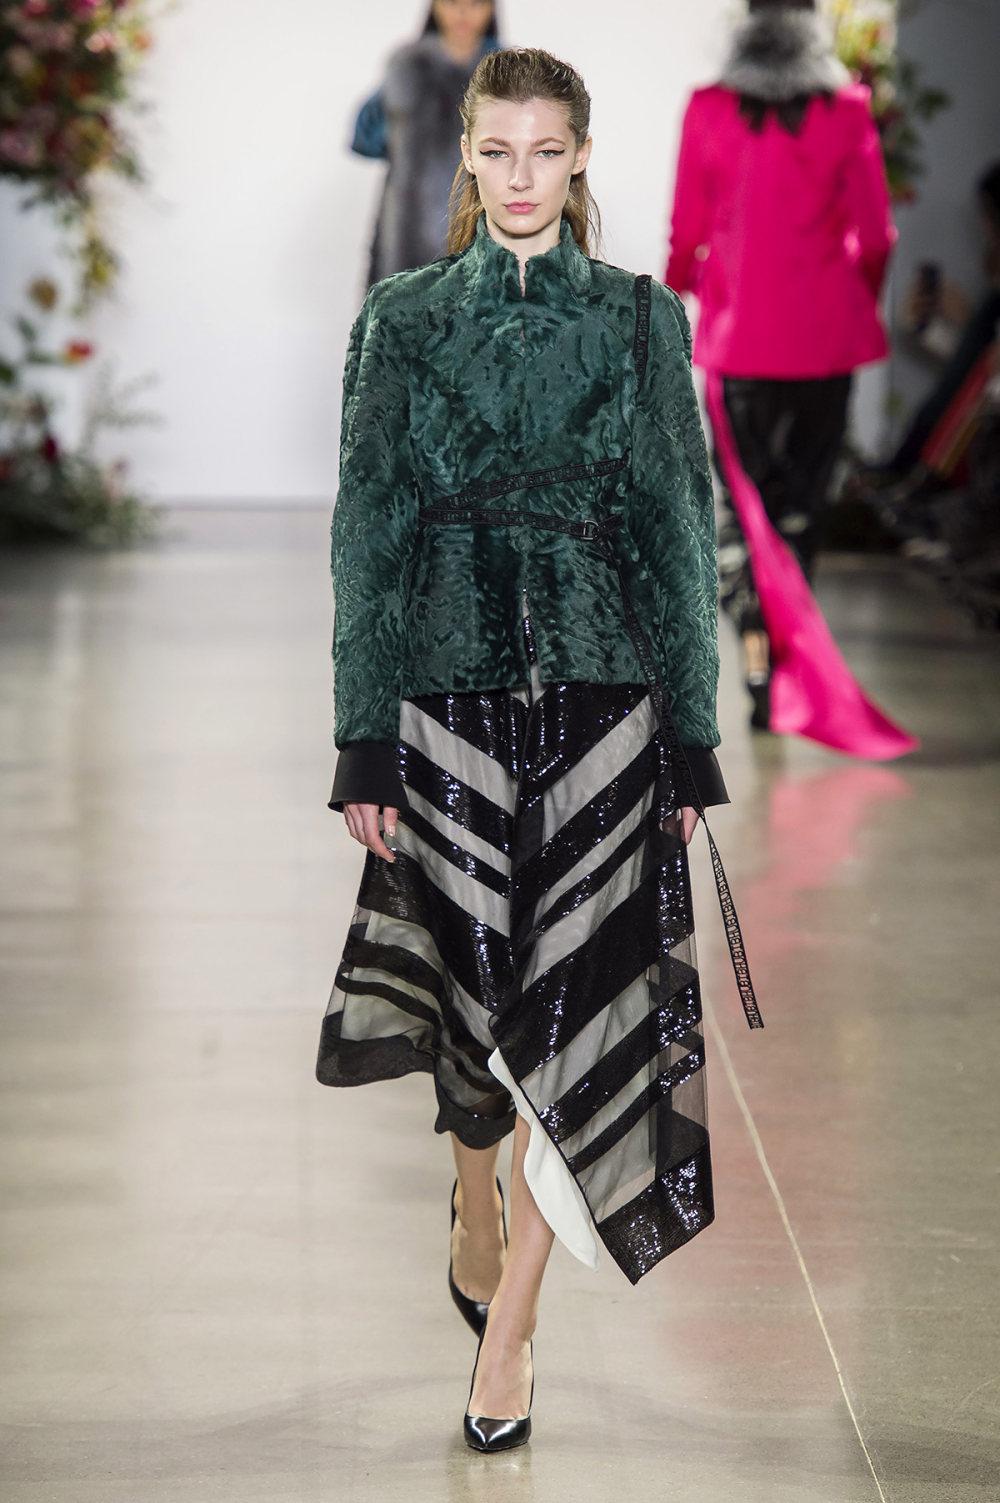 Bibhu Mohapatra时装系列颜色点缀蕾丝刺绣和结构的压轴礼服-24.jpg